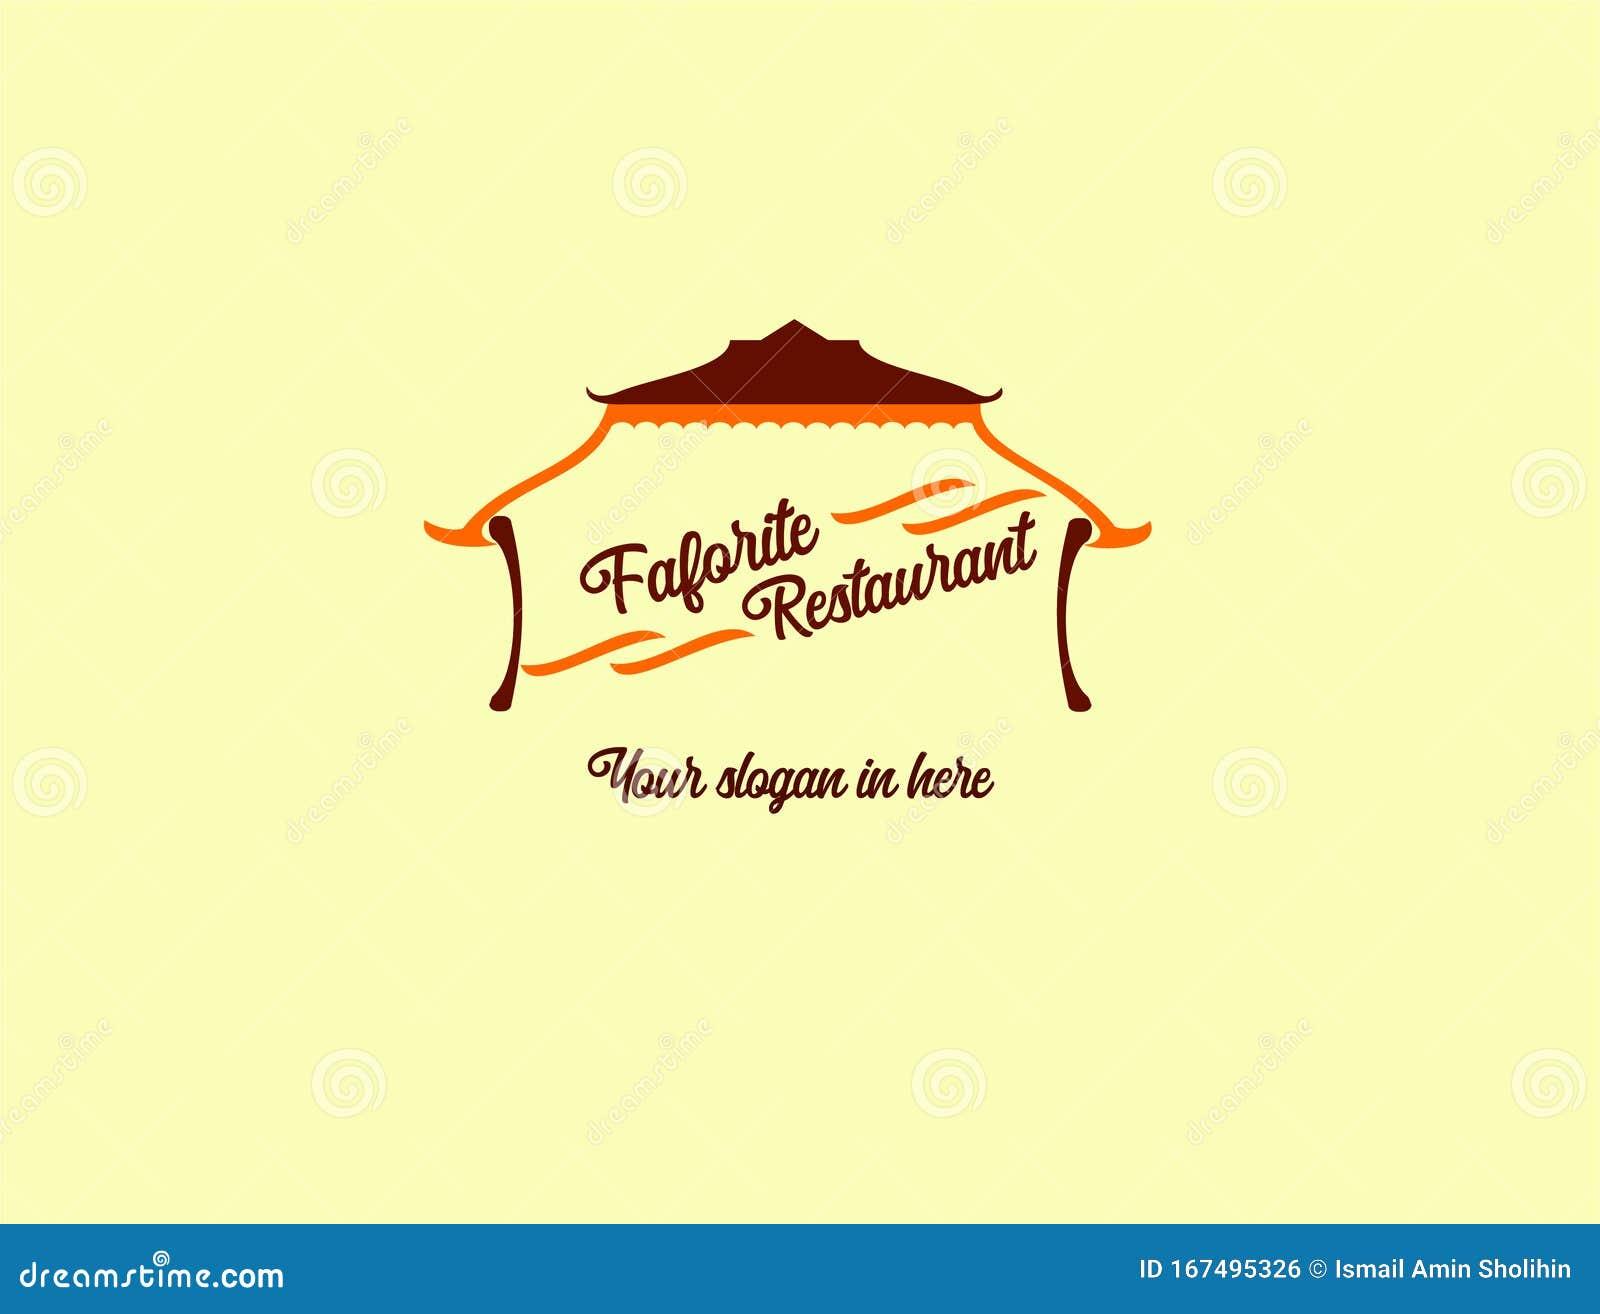 Logo Favorite Restaurant Design Logo Company Logo Traditional Company Stock Vector Illustration Of House Real 167495326